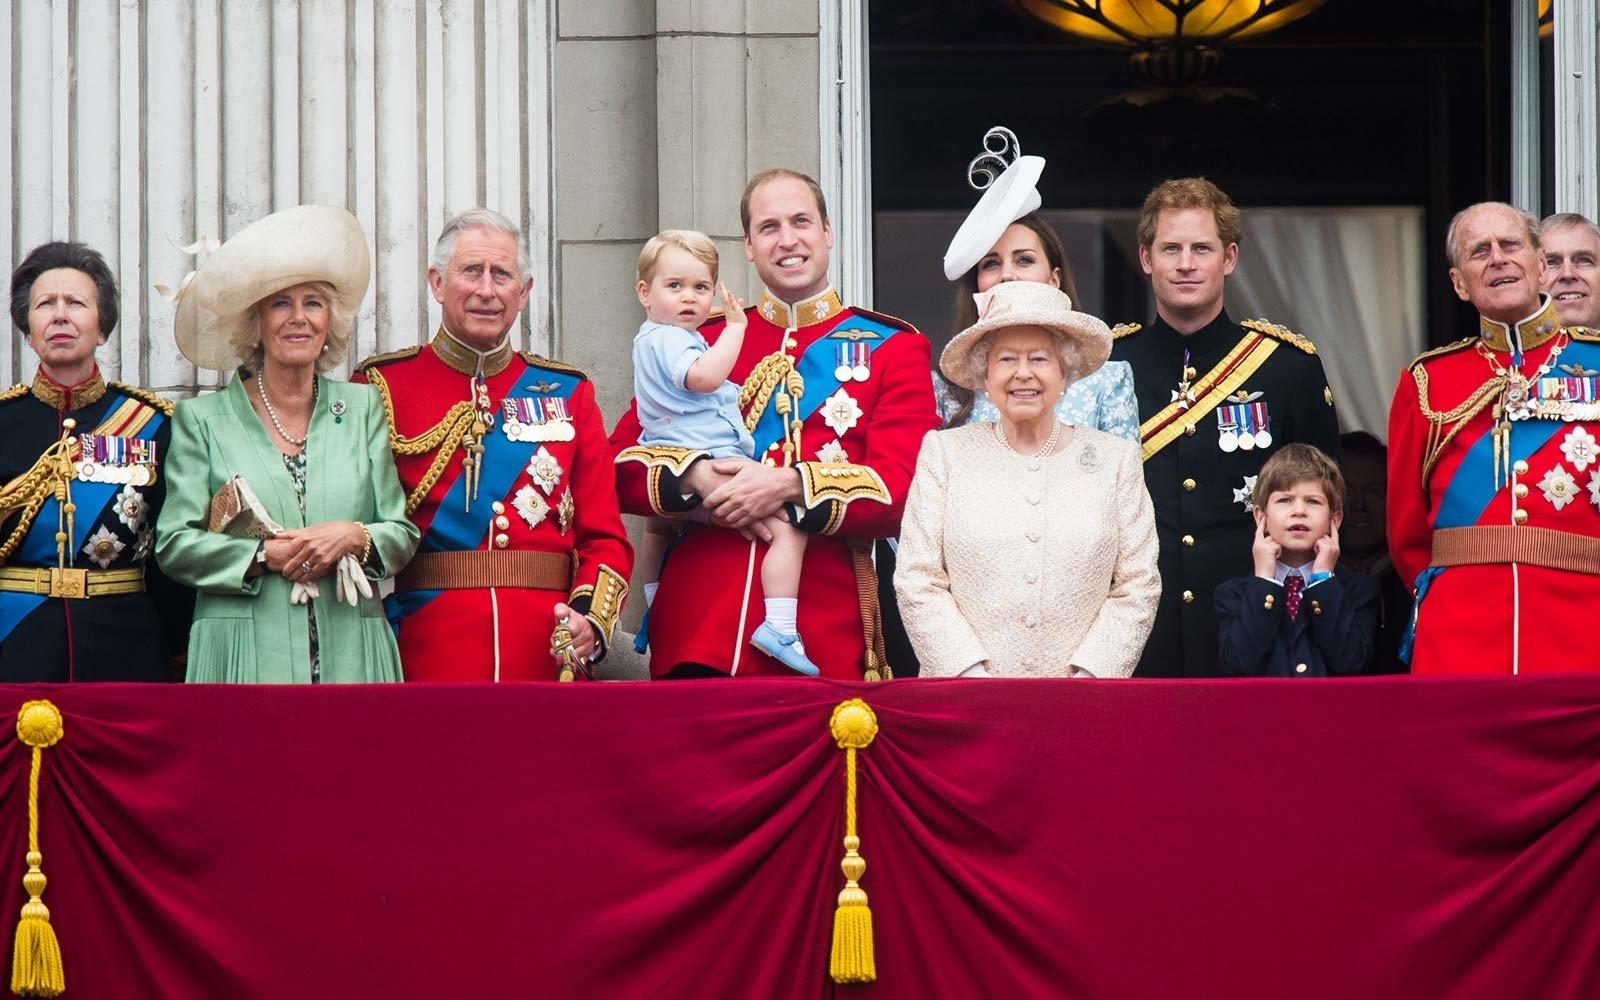 british royal family united kingdom royalfamtree0817.jpg?resize=1200,630 - 10 regras estranhas que a Família Real precisa seguir